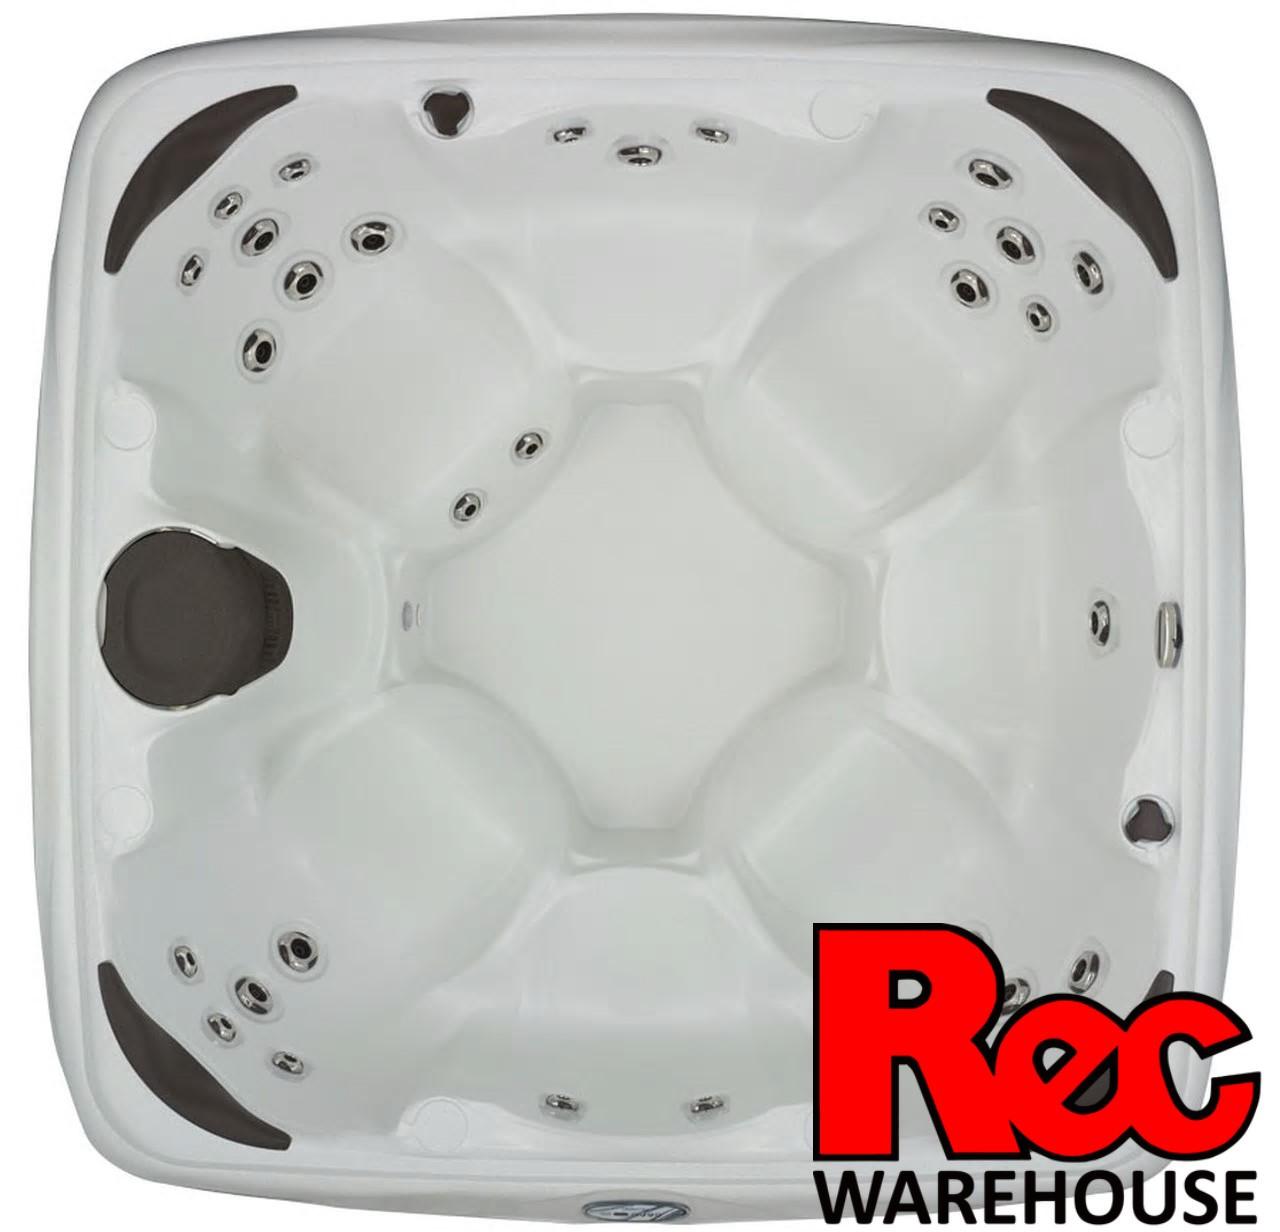 Crossover 730S Plug & Play 6-7 Person Hot Tub